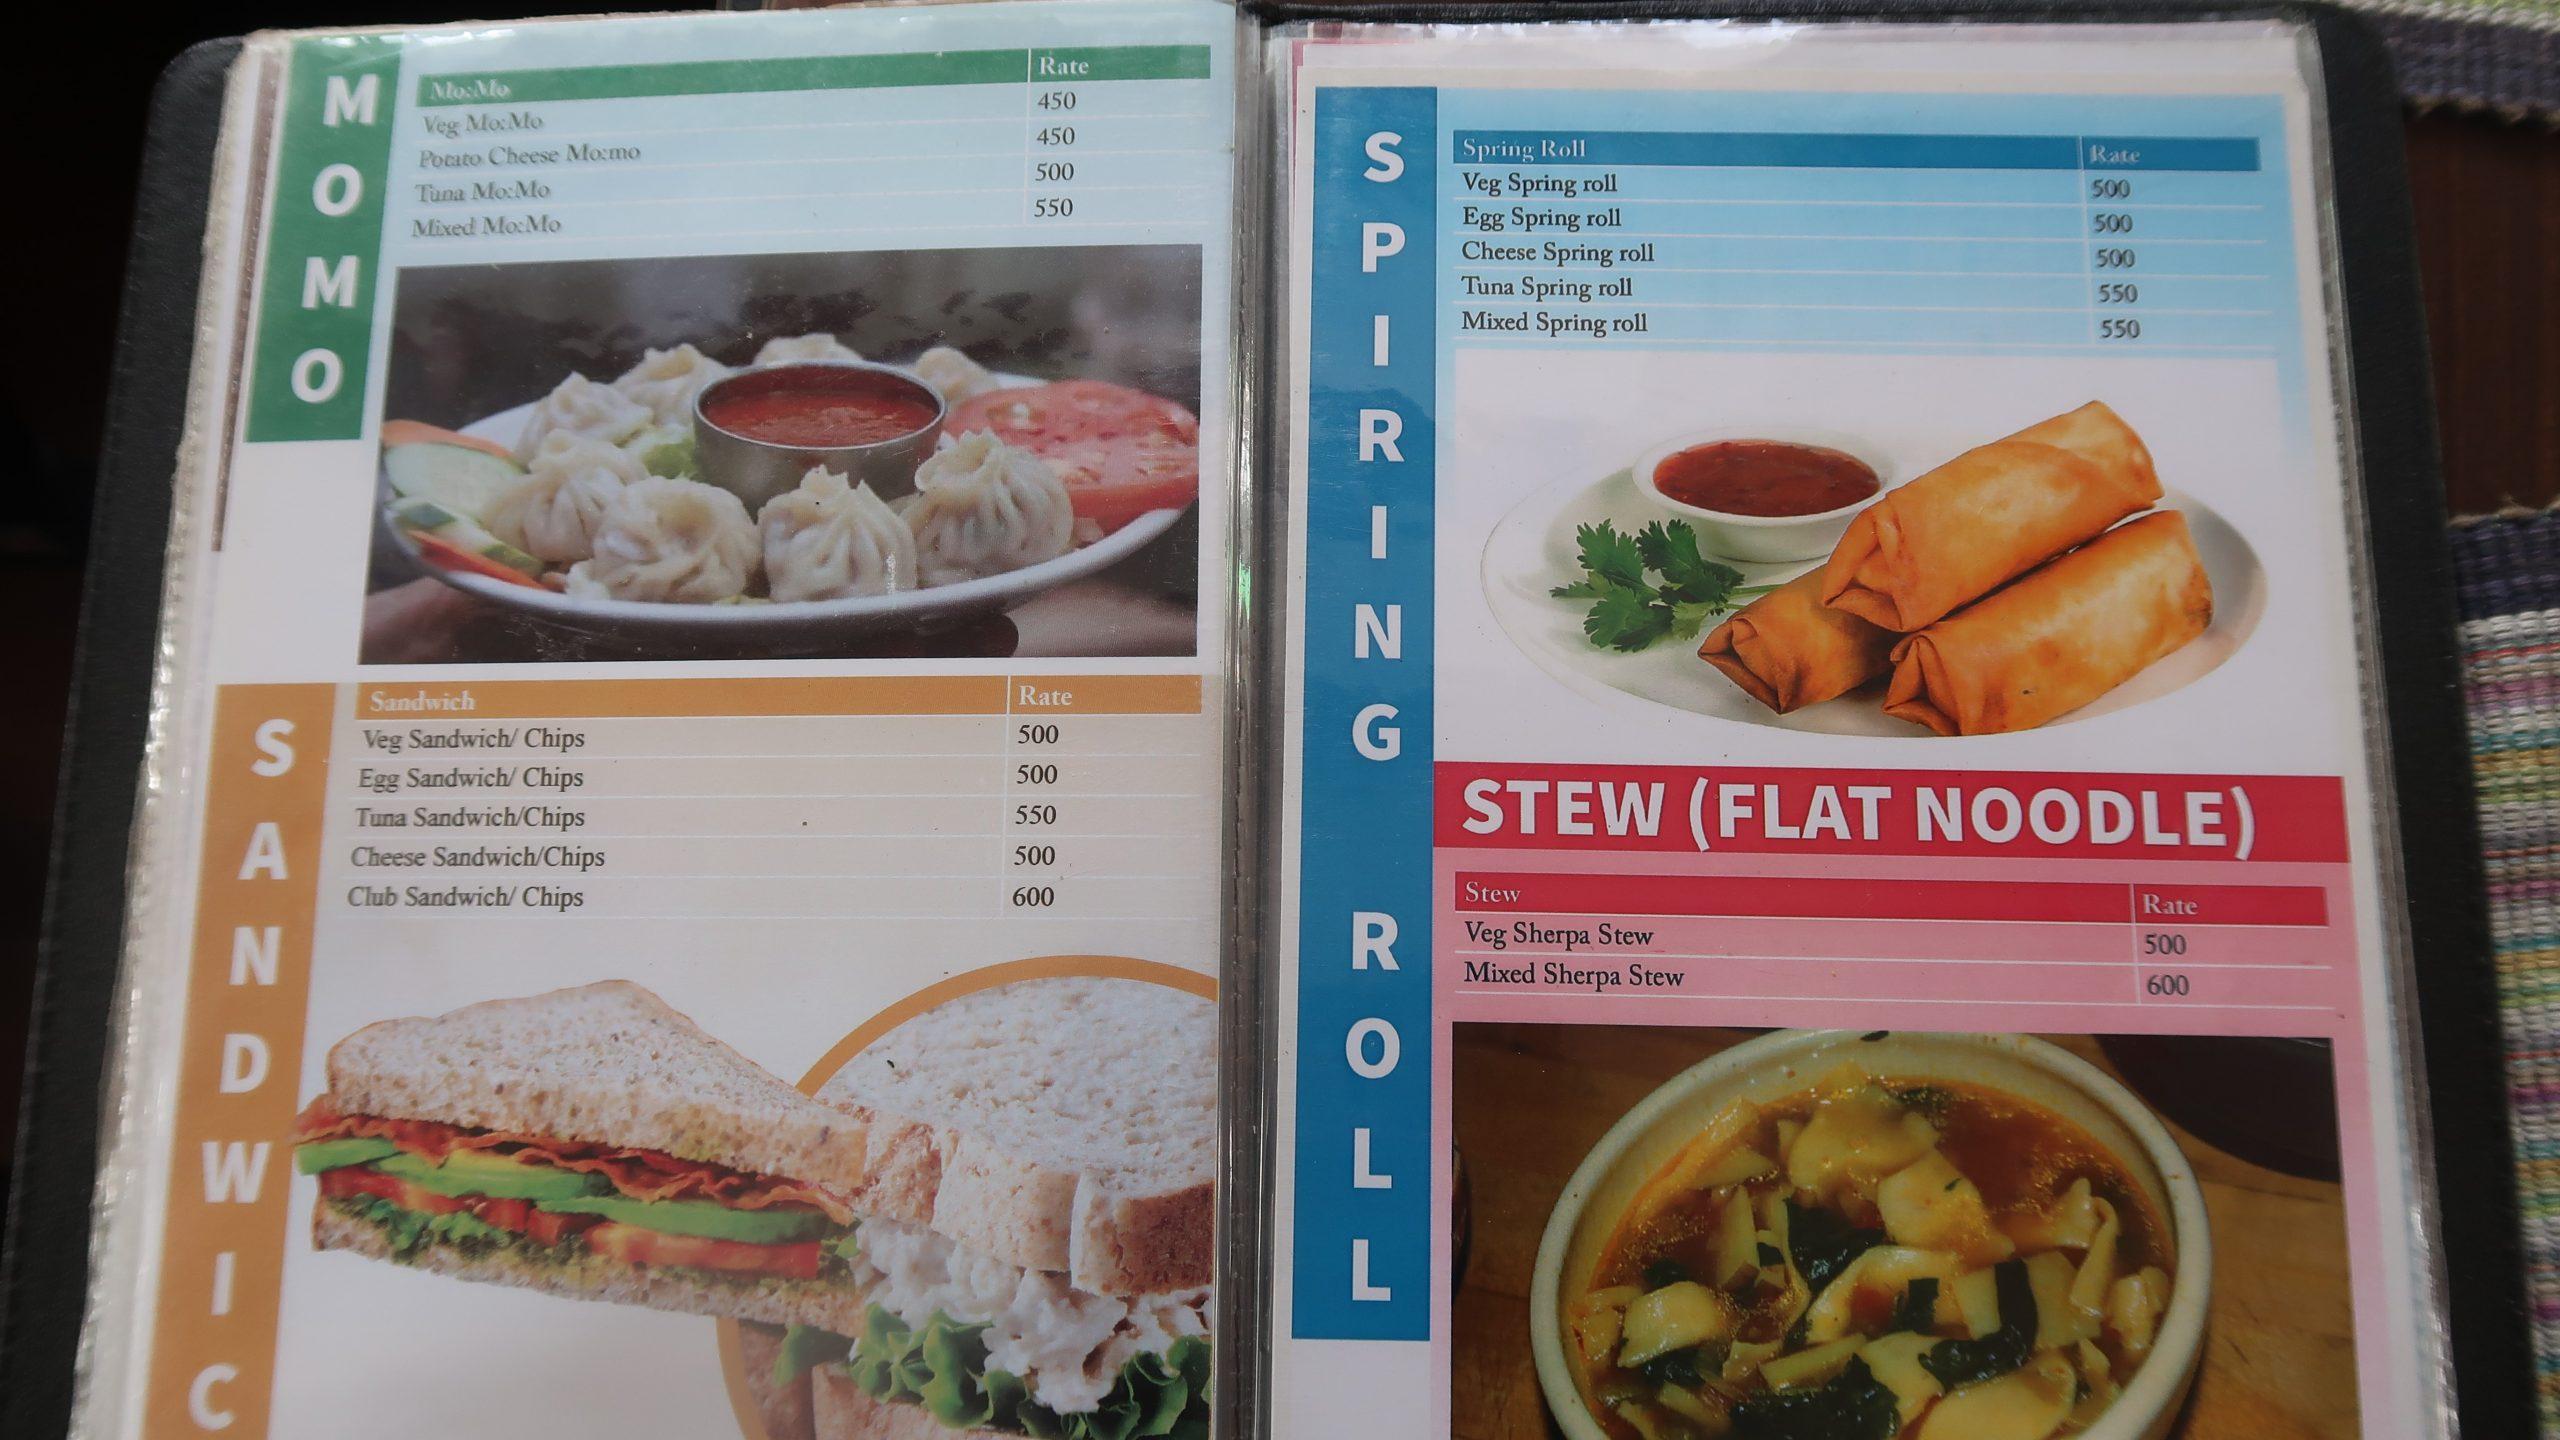 Sample menu for reference